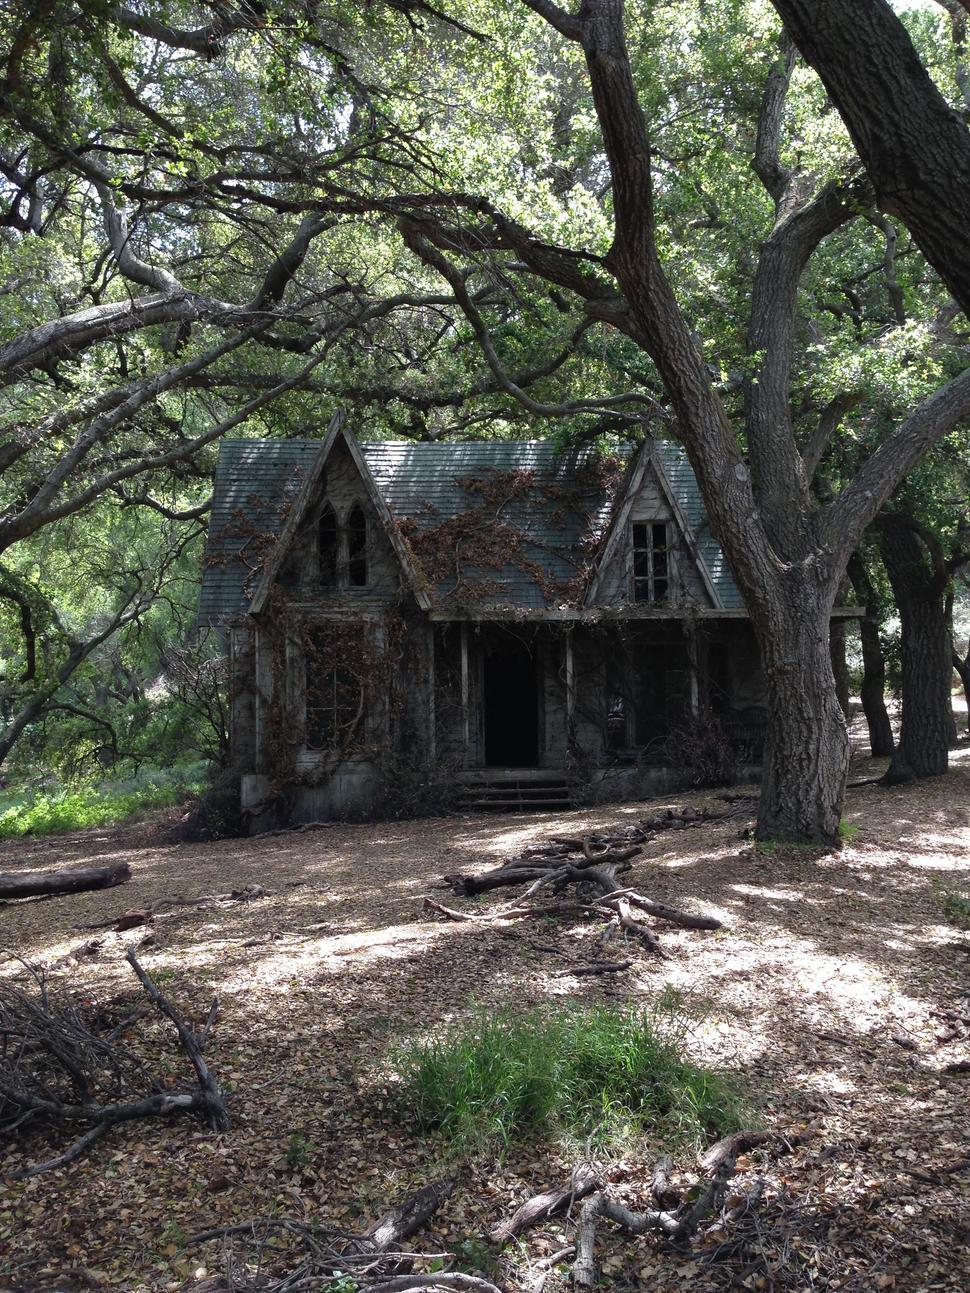 21 Lugares Usados para Peliculas que hoy estan Abandonados!